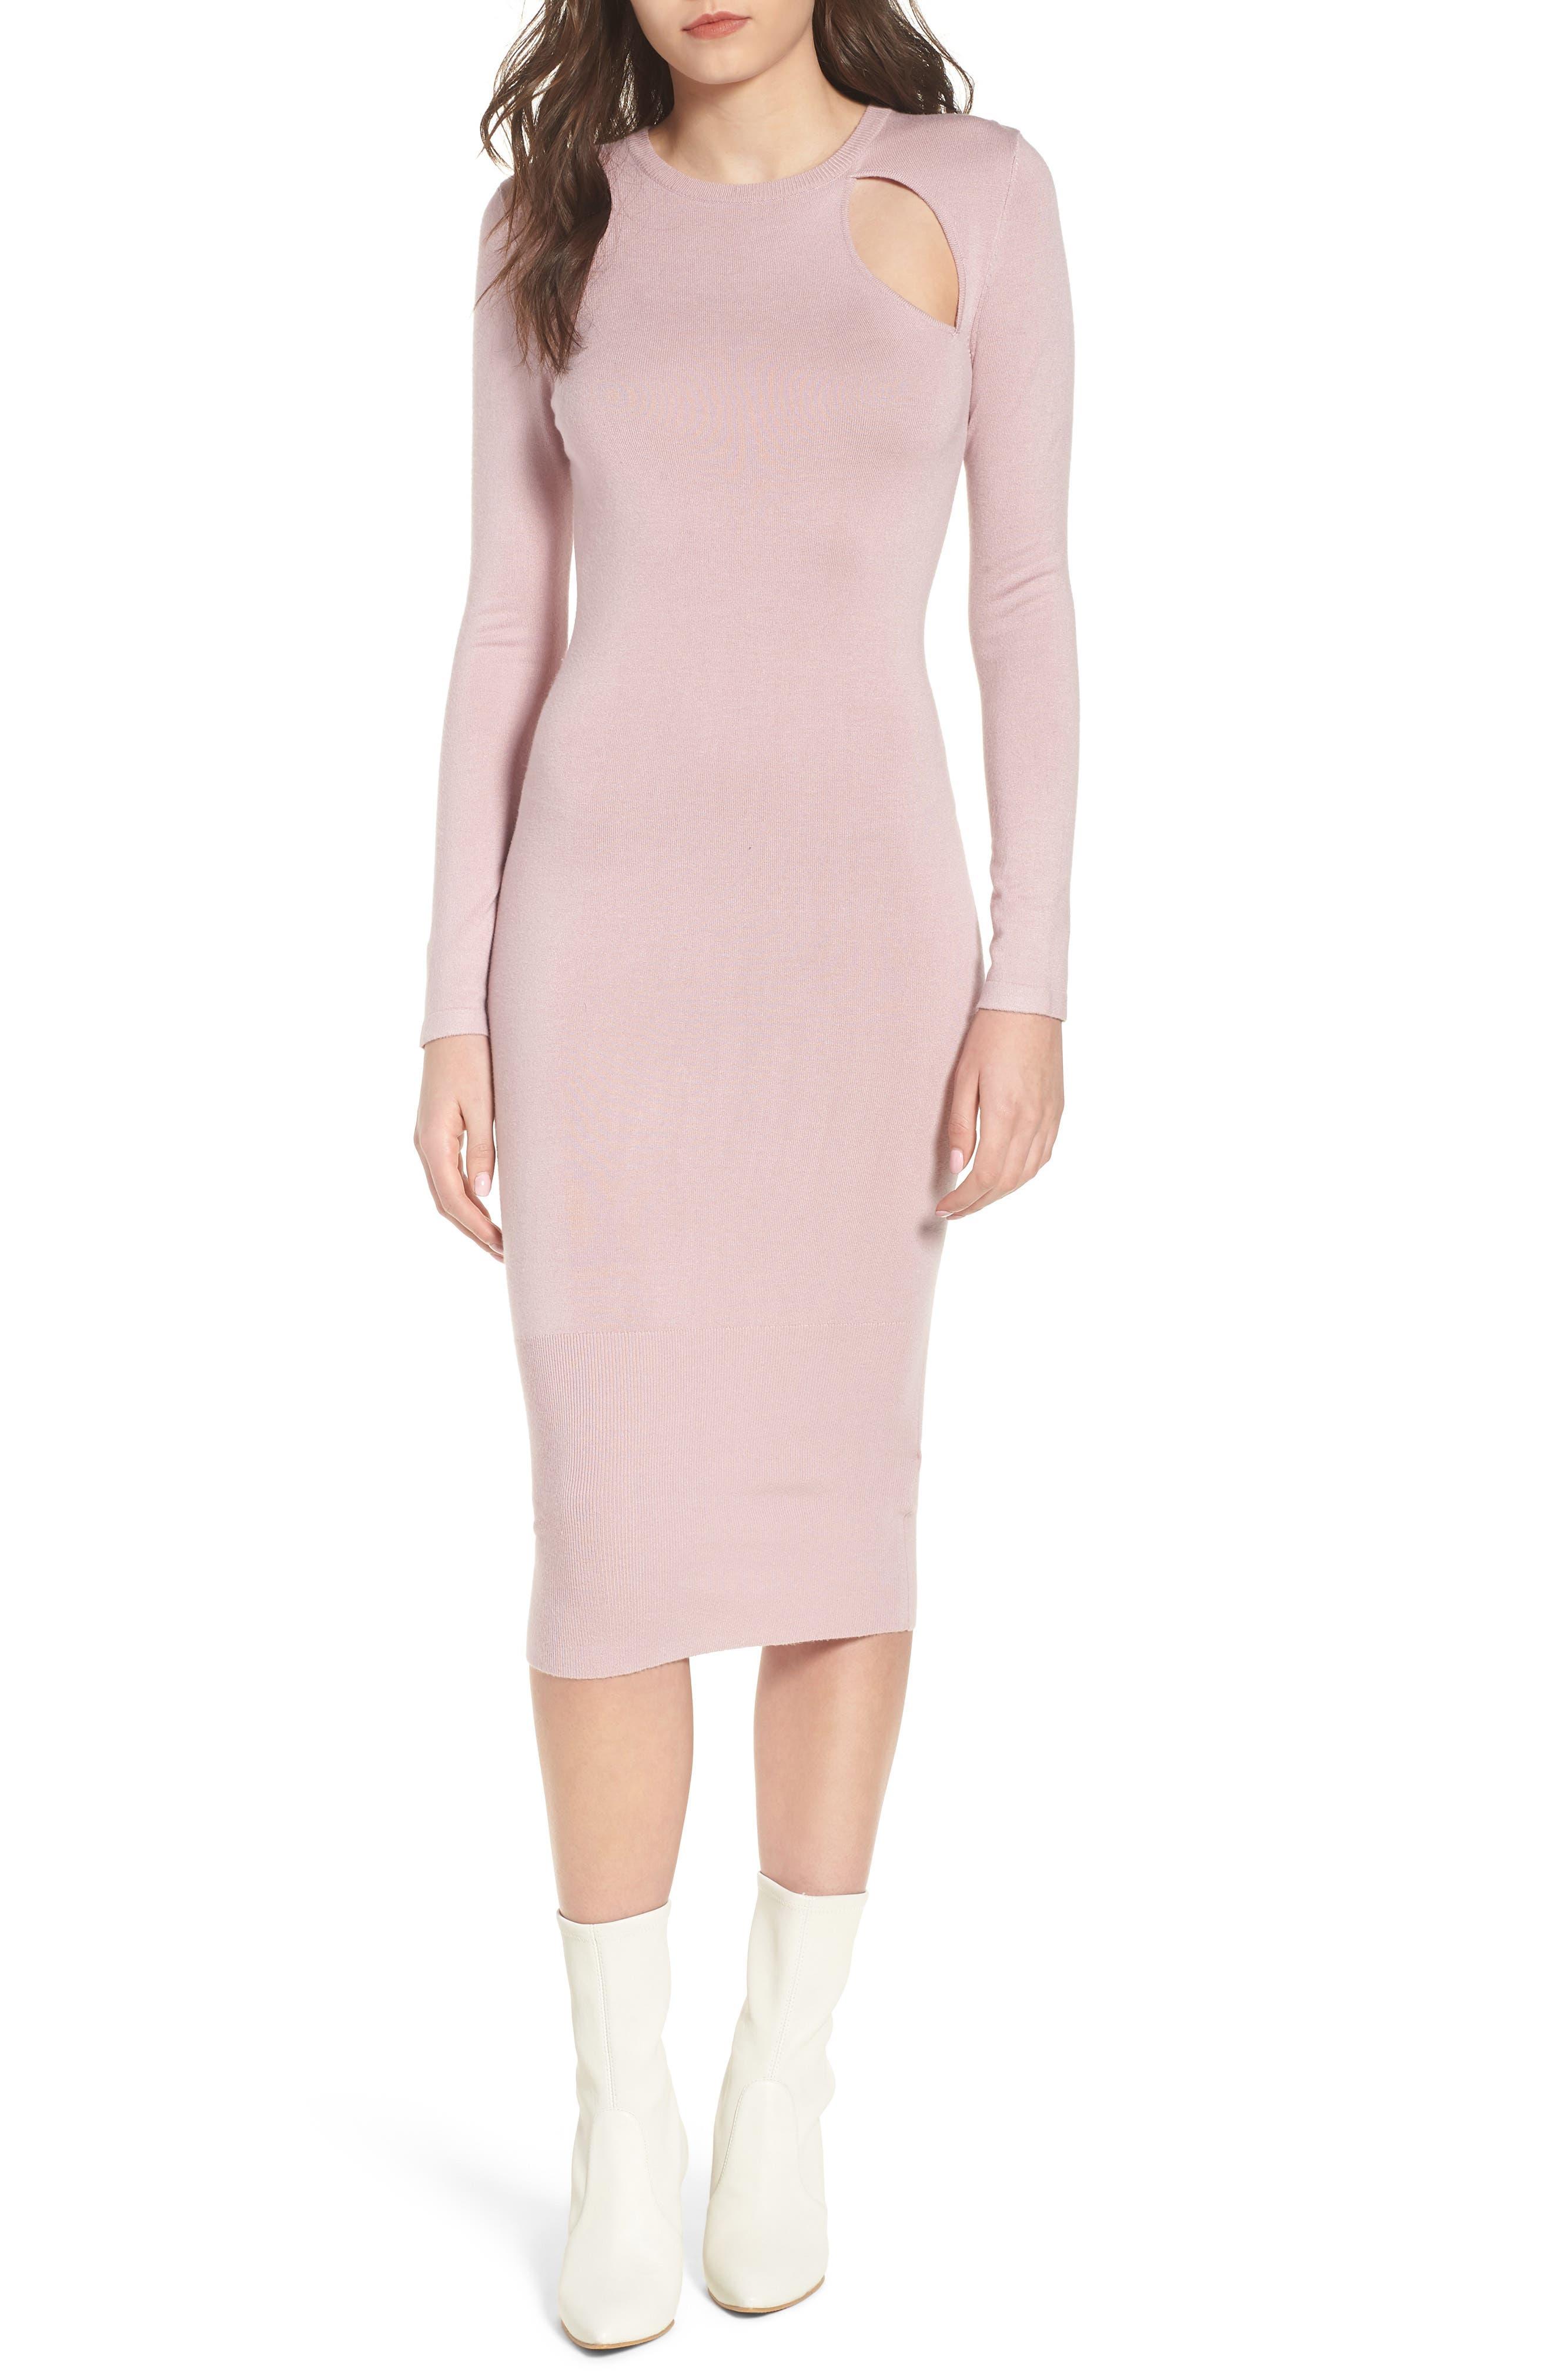 Body-Con Midi Dress,                             Main thumbnail 1, color,                             Light Pink